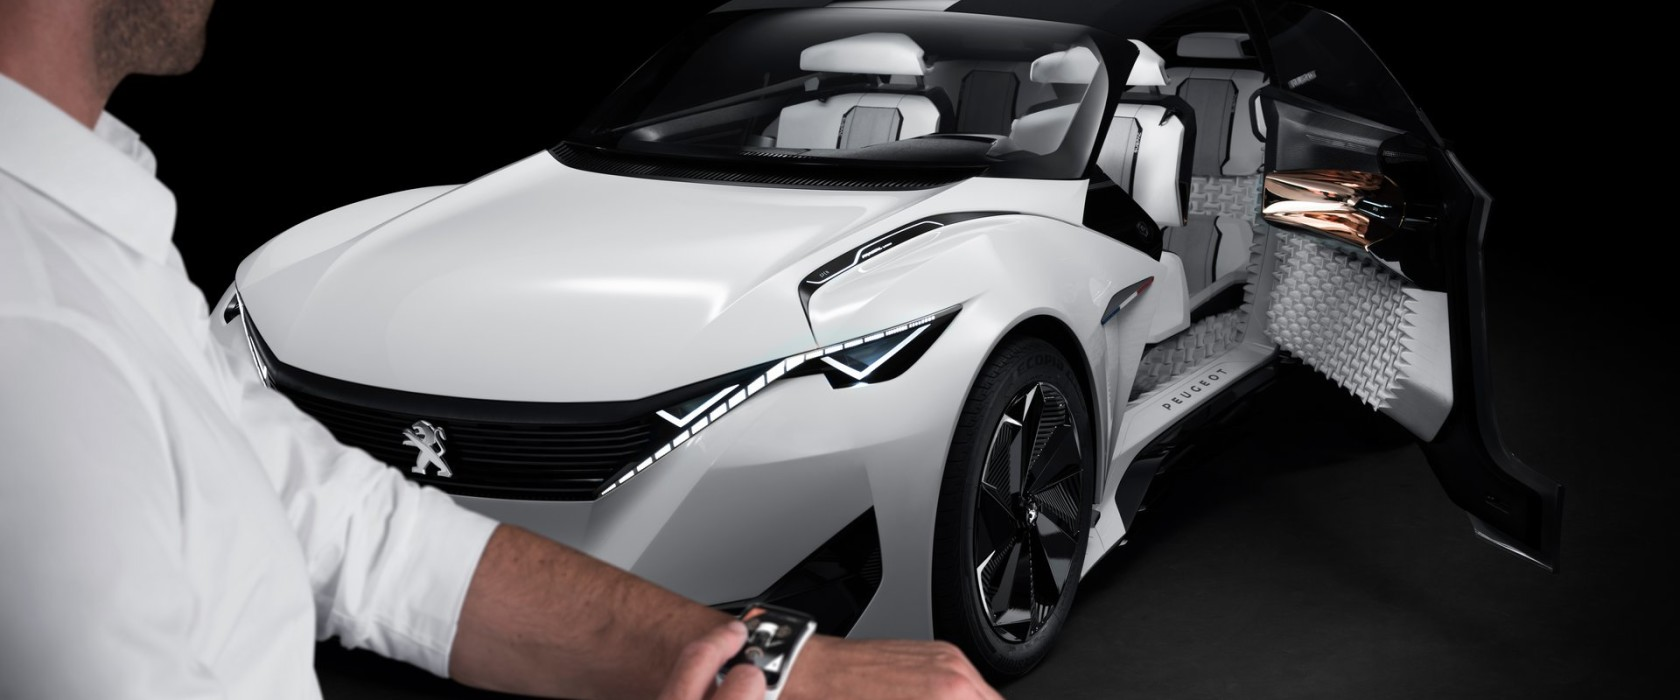 PeugeotPushtoPass-apertura